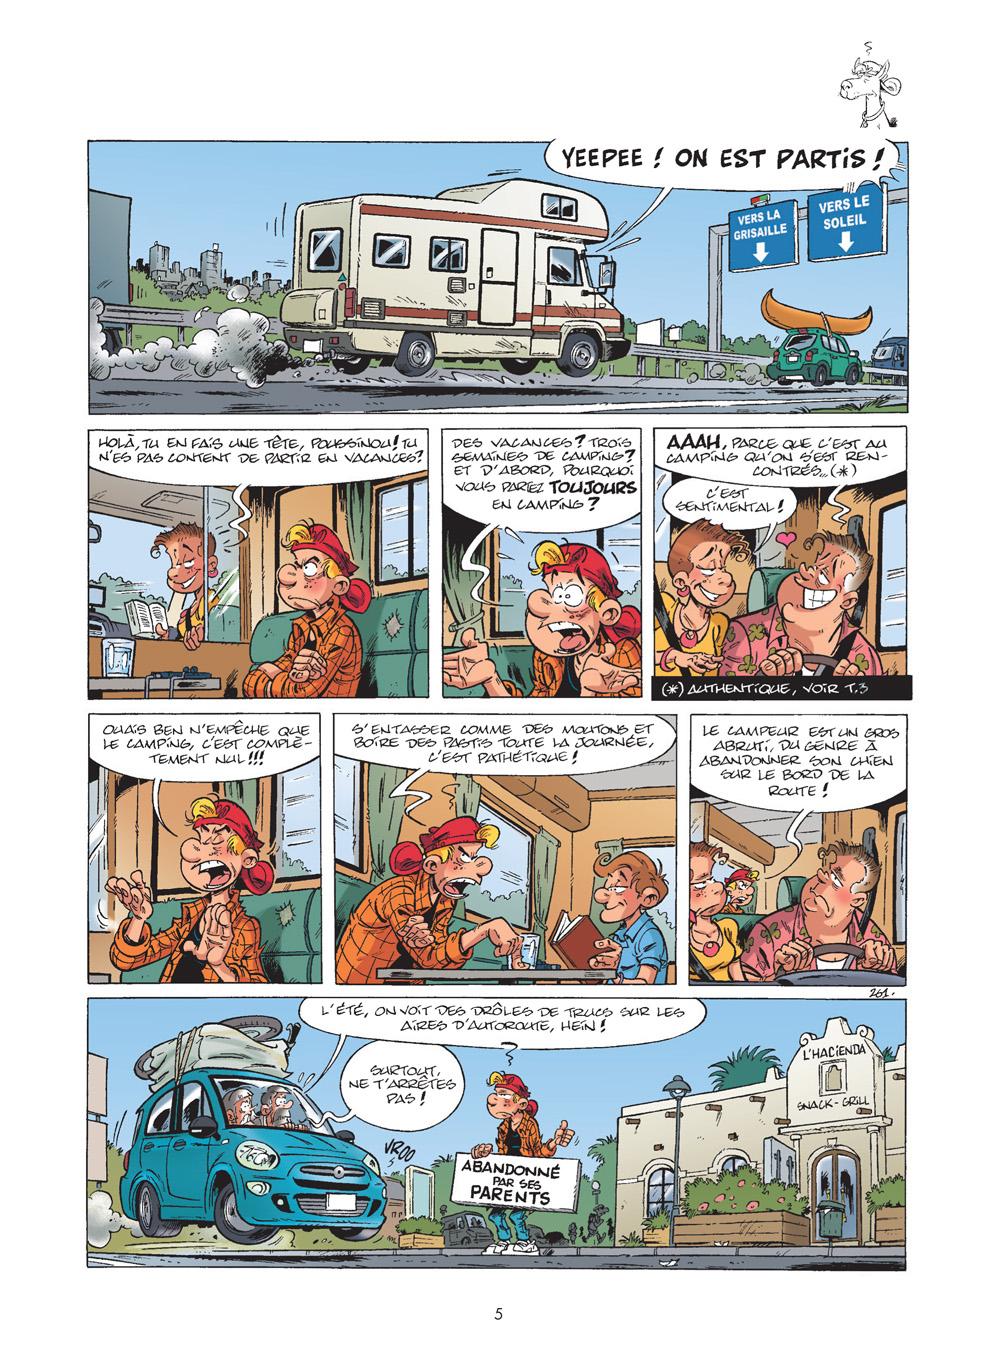 Boulard #7 planche 3